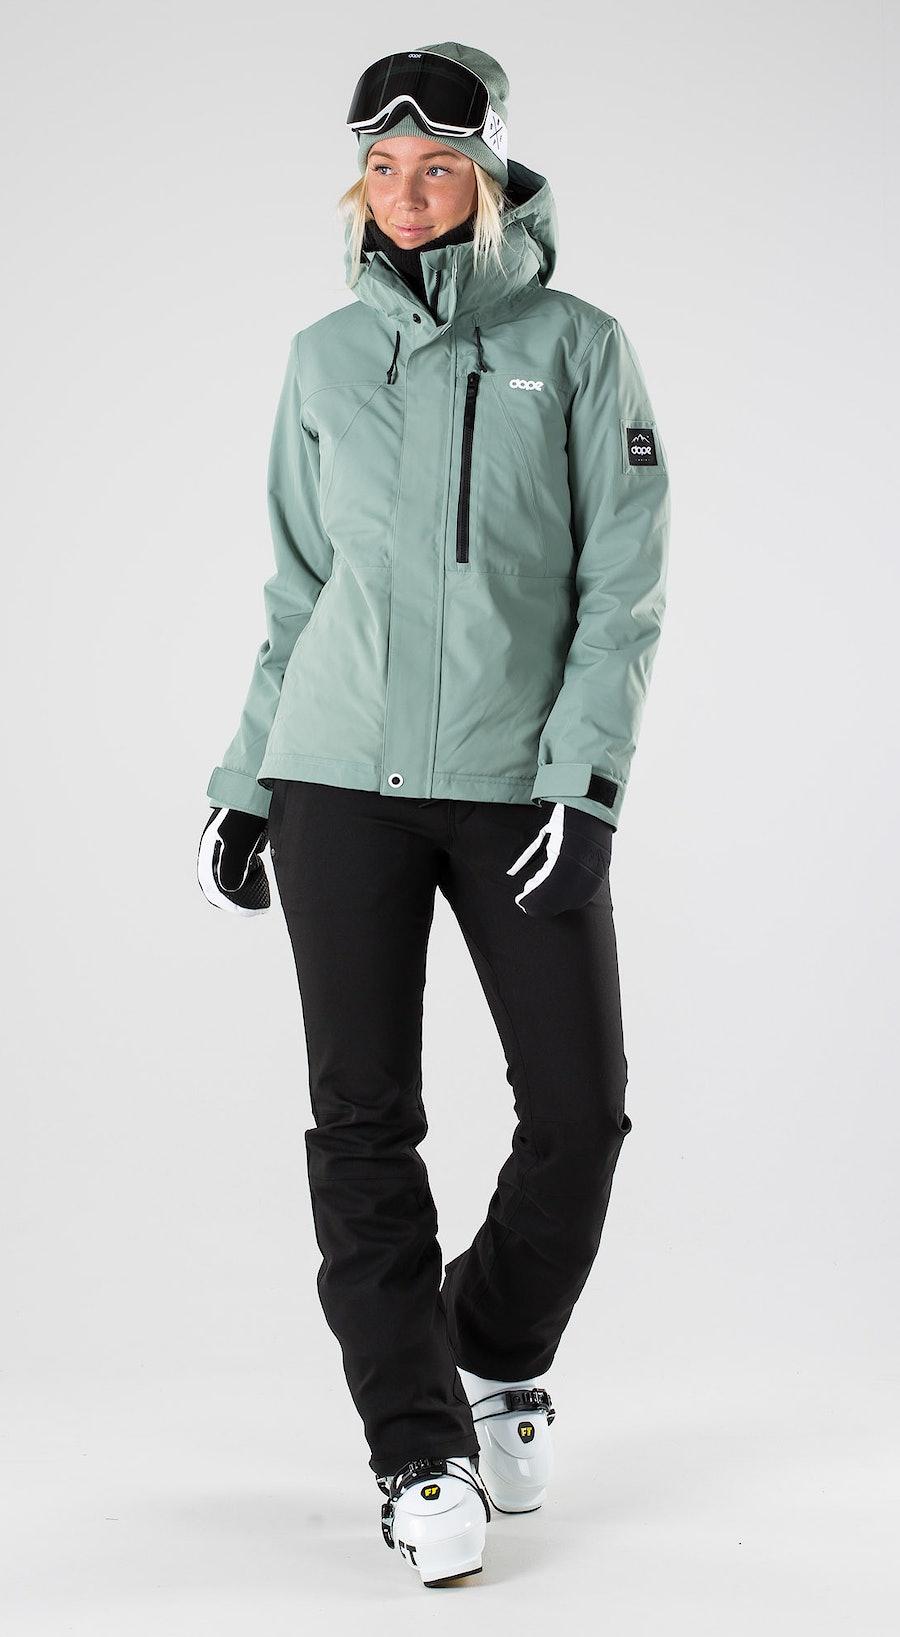 Dope Divine Faded Green Ski clothing Multi